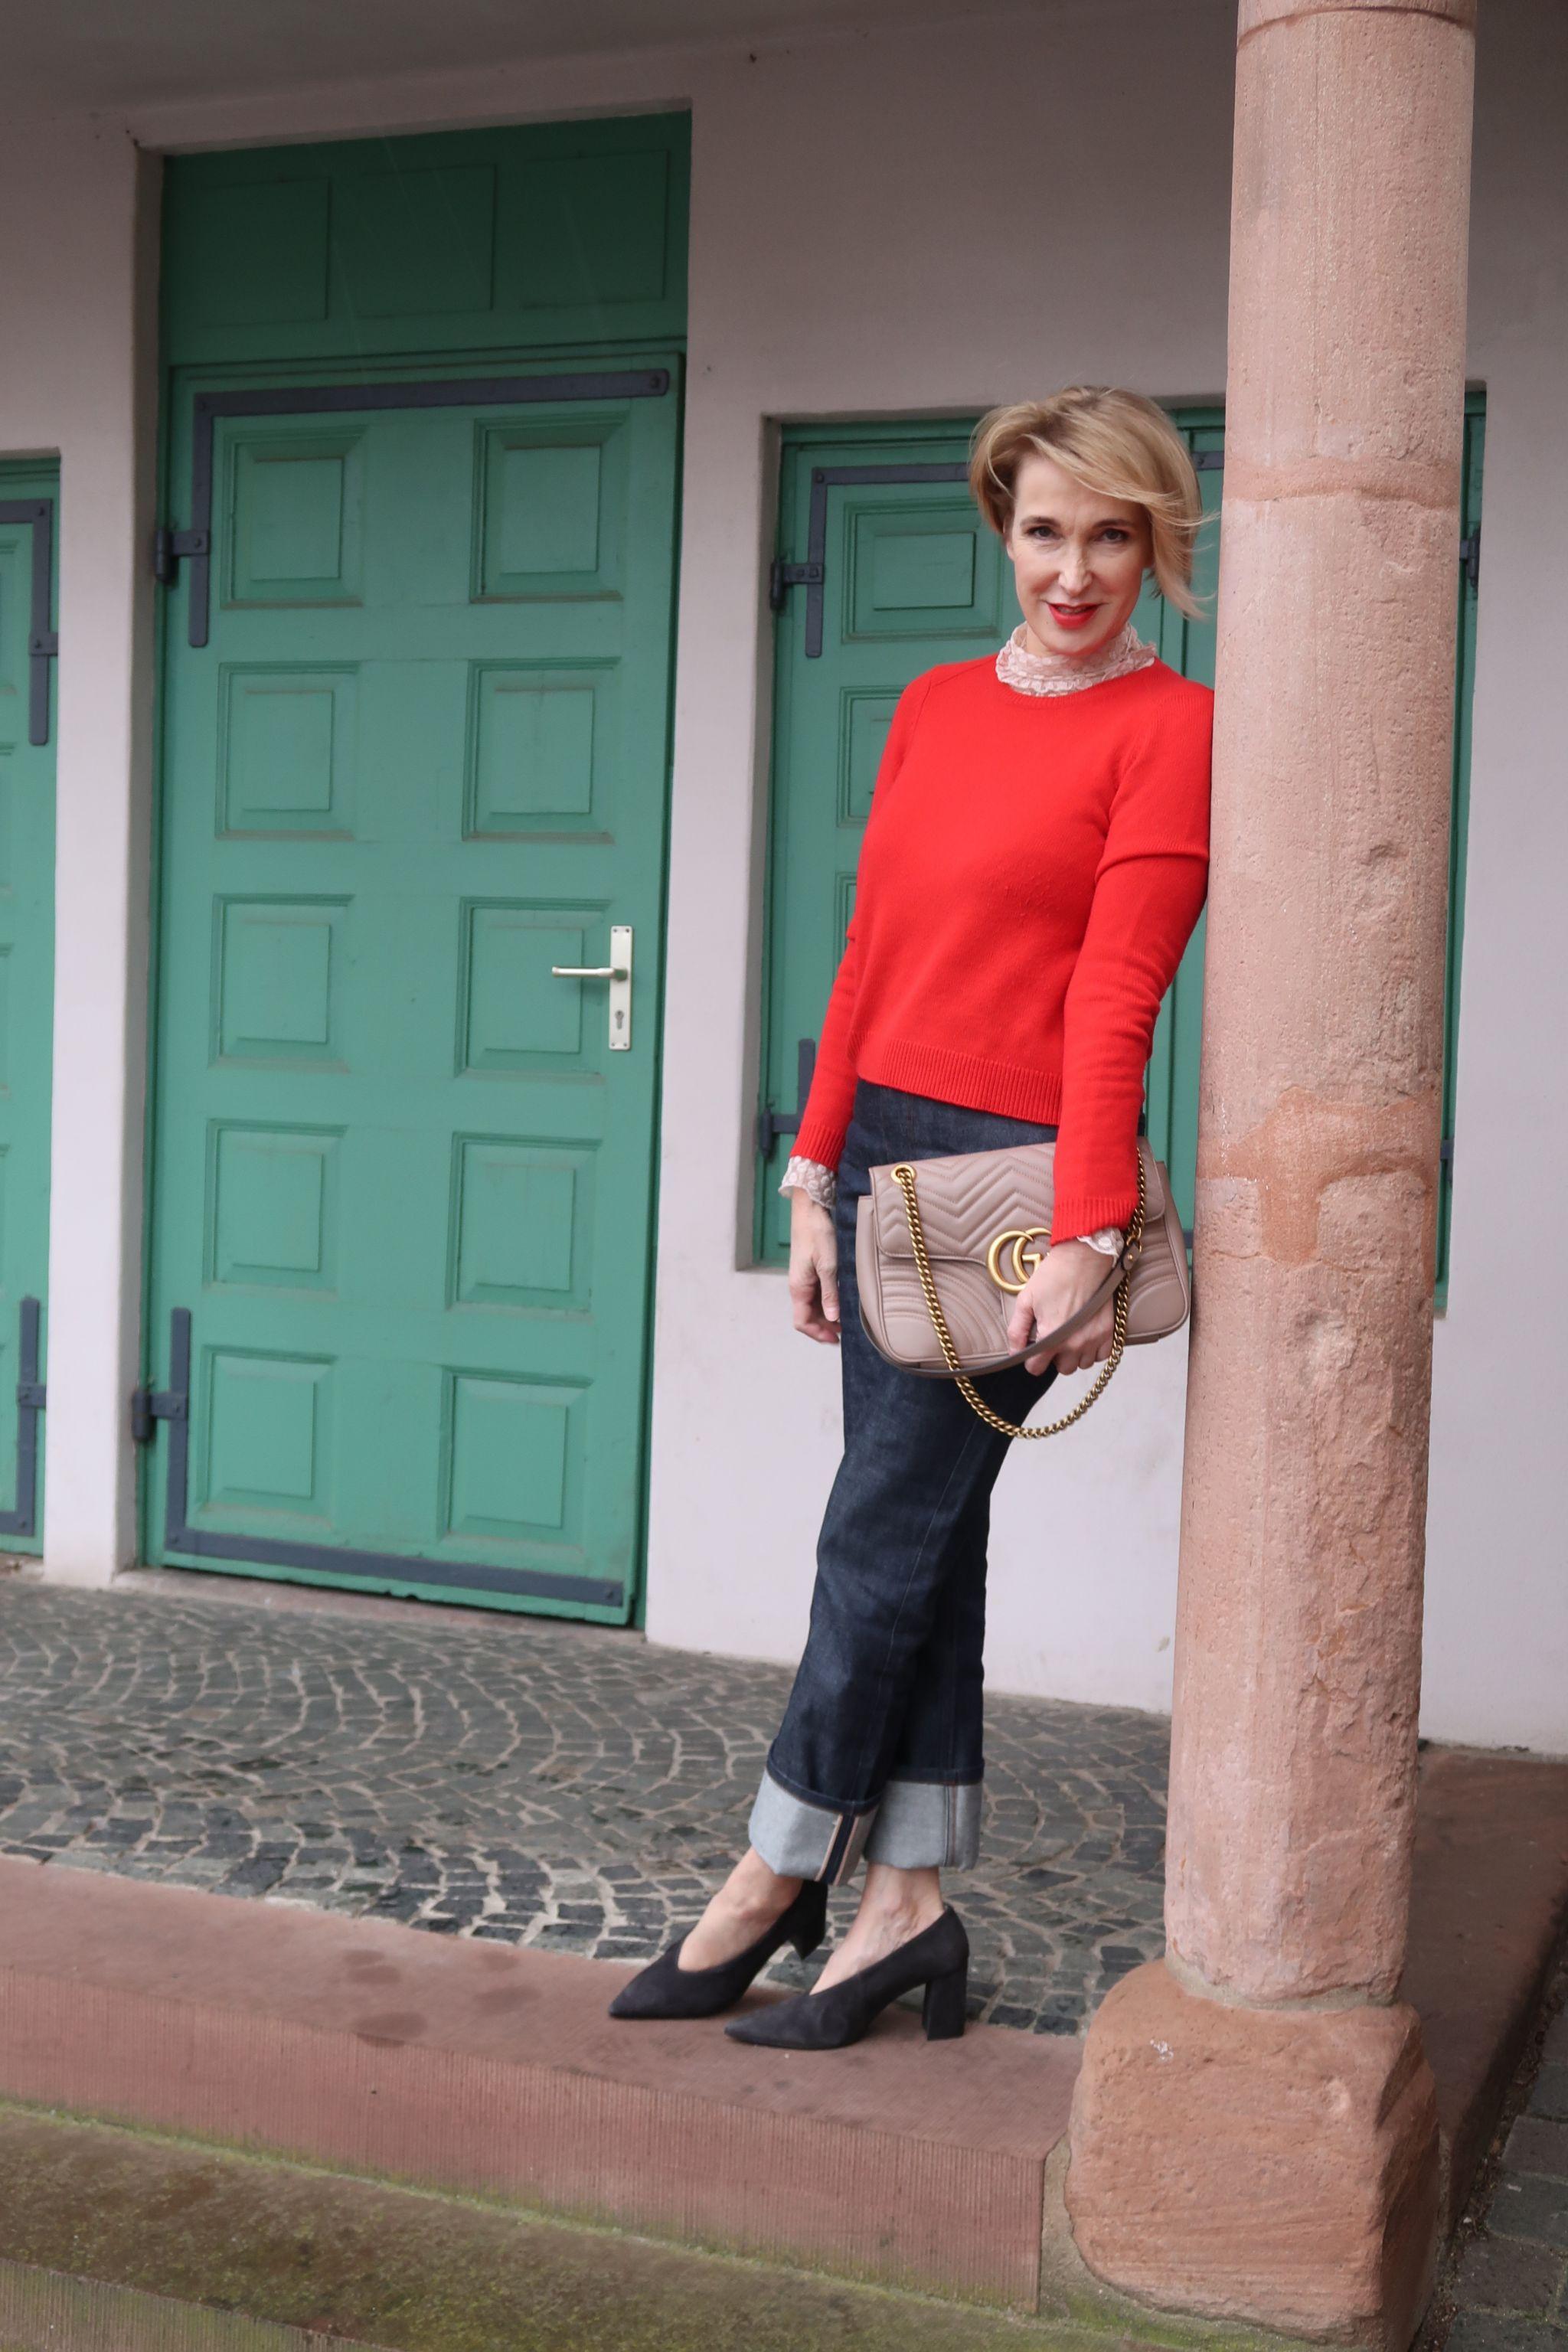 glamupyourlifestyle kaschmir-Pullover winter-Blue Pumps ue40-Blog ue40-Mode fashionblog